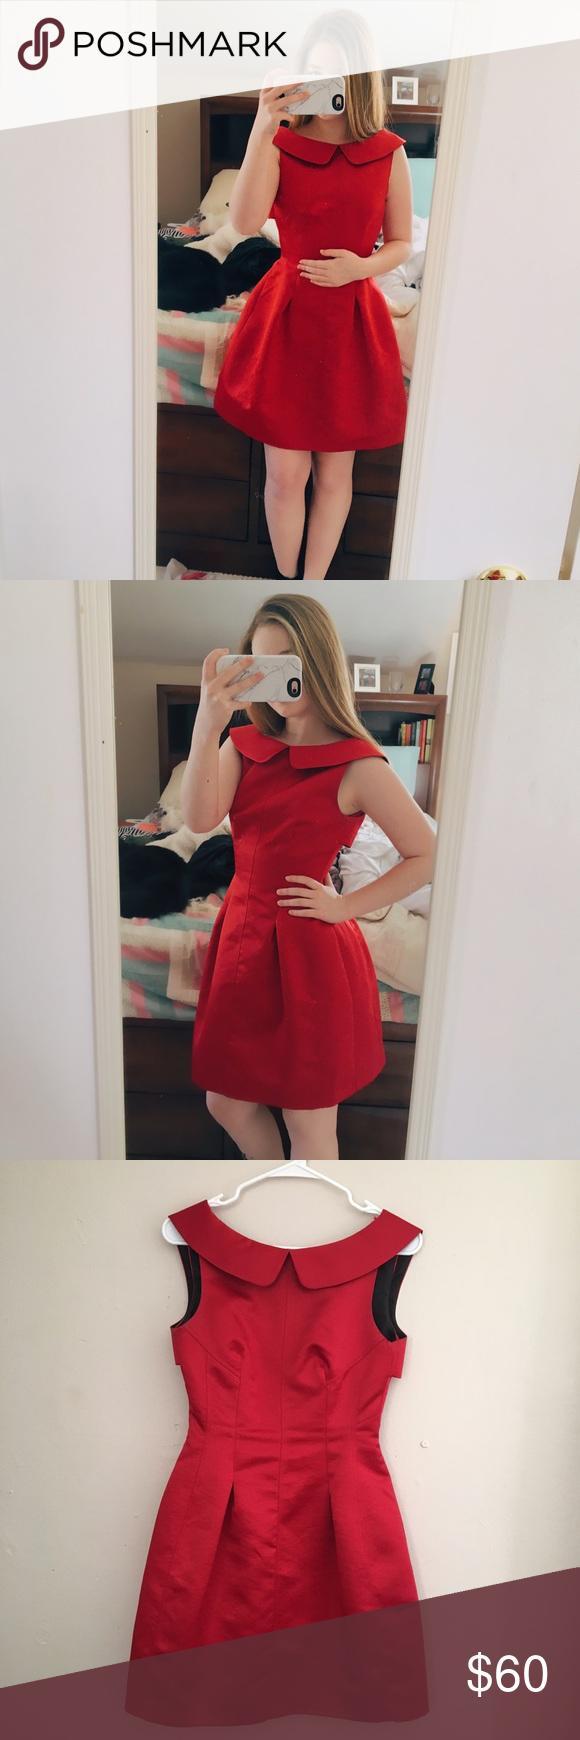 Sale zara red dress fancy and elegant red cocktail dress from zara